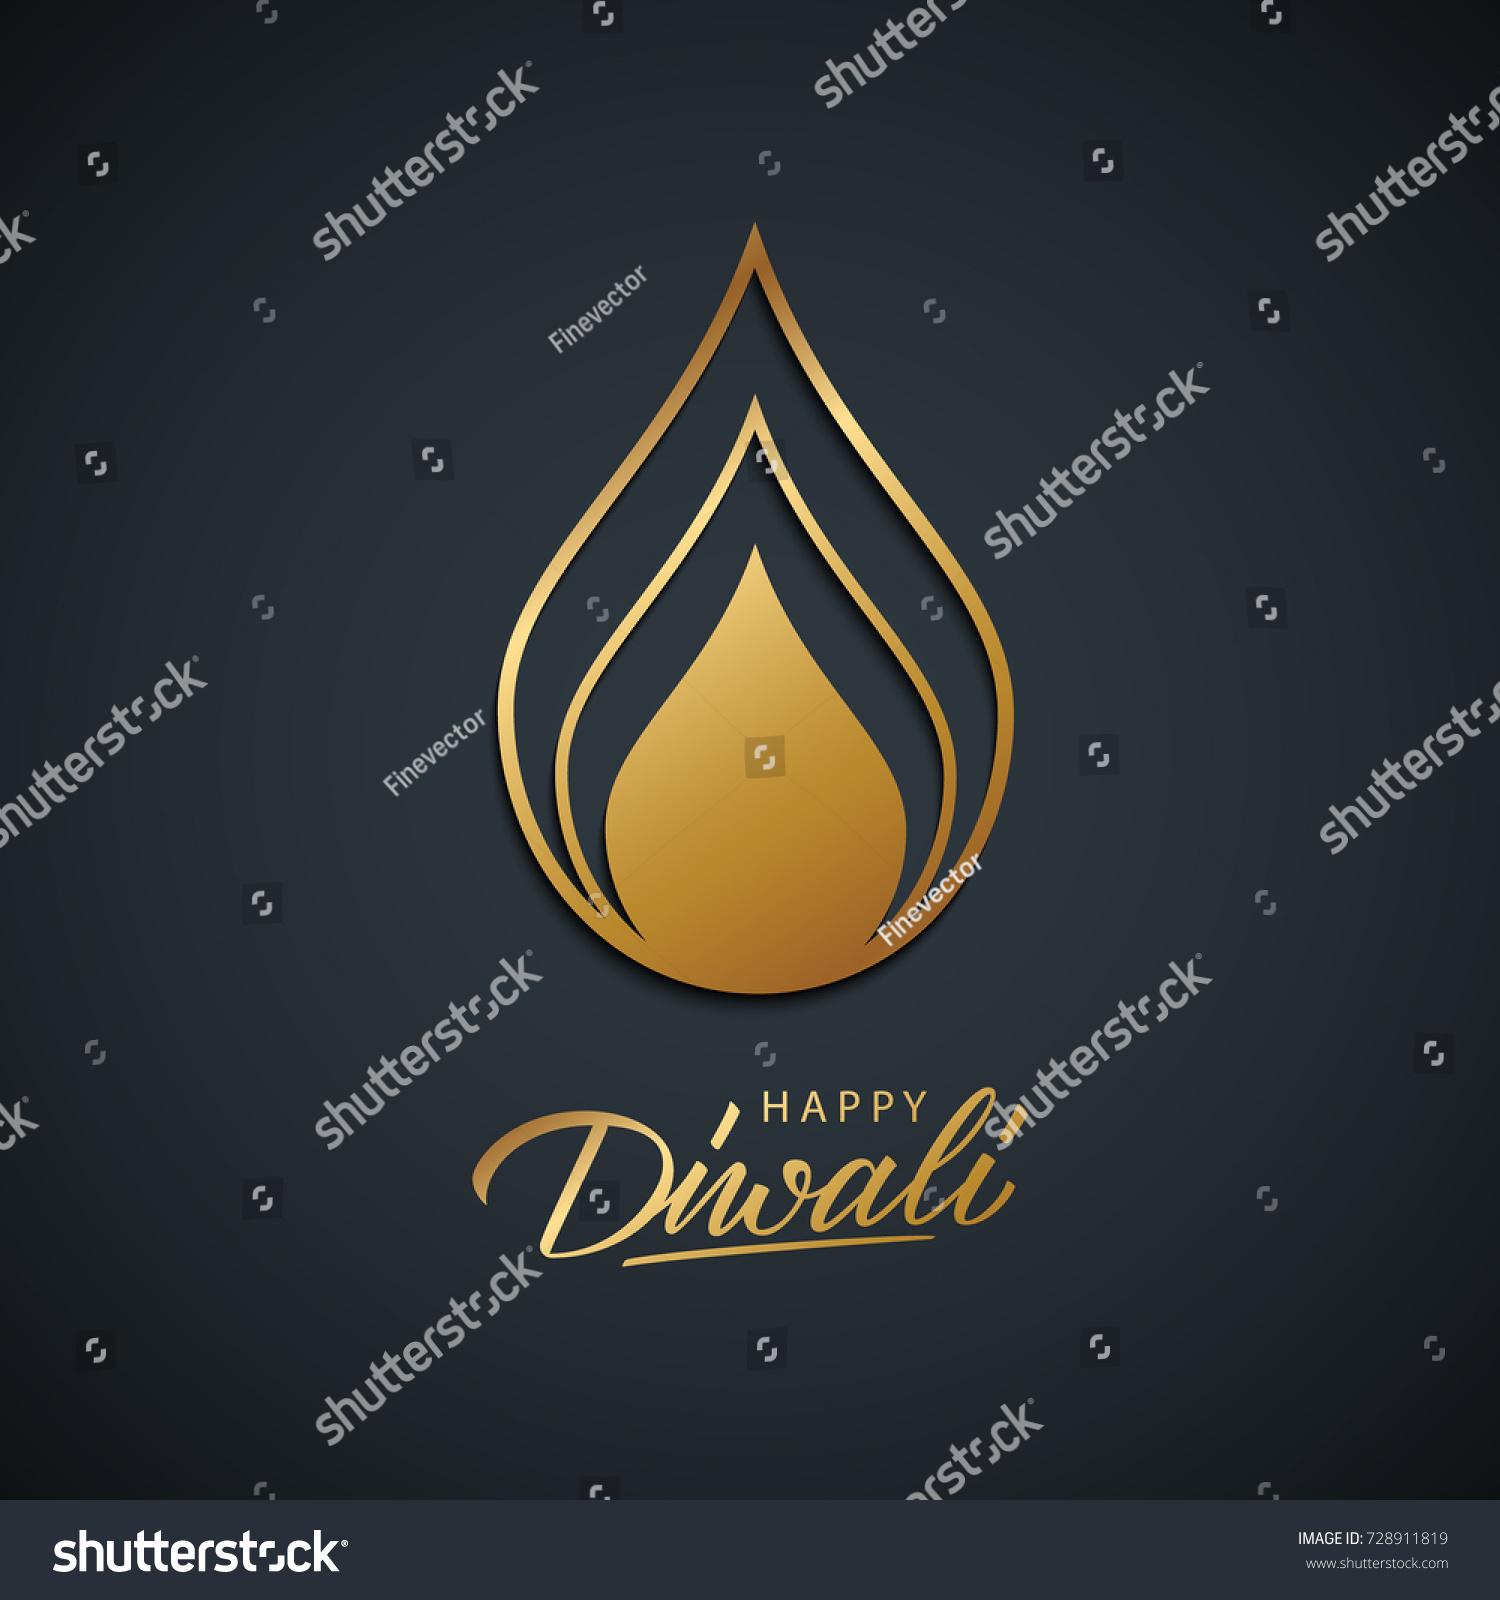 Happy Diwali Greeting Card India Festival Stock Vector Royalty Free